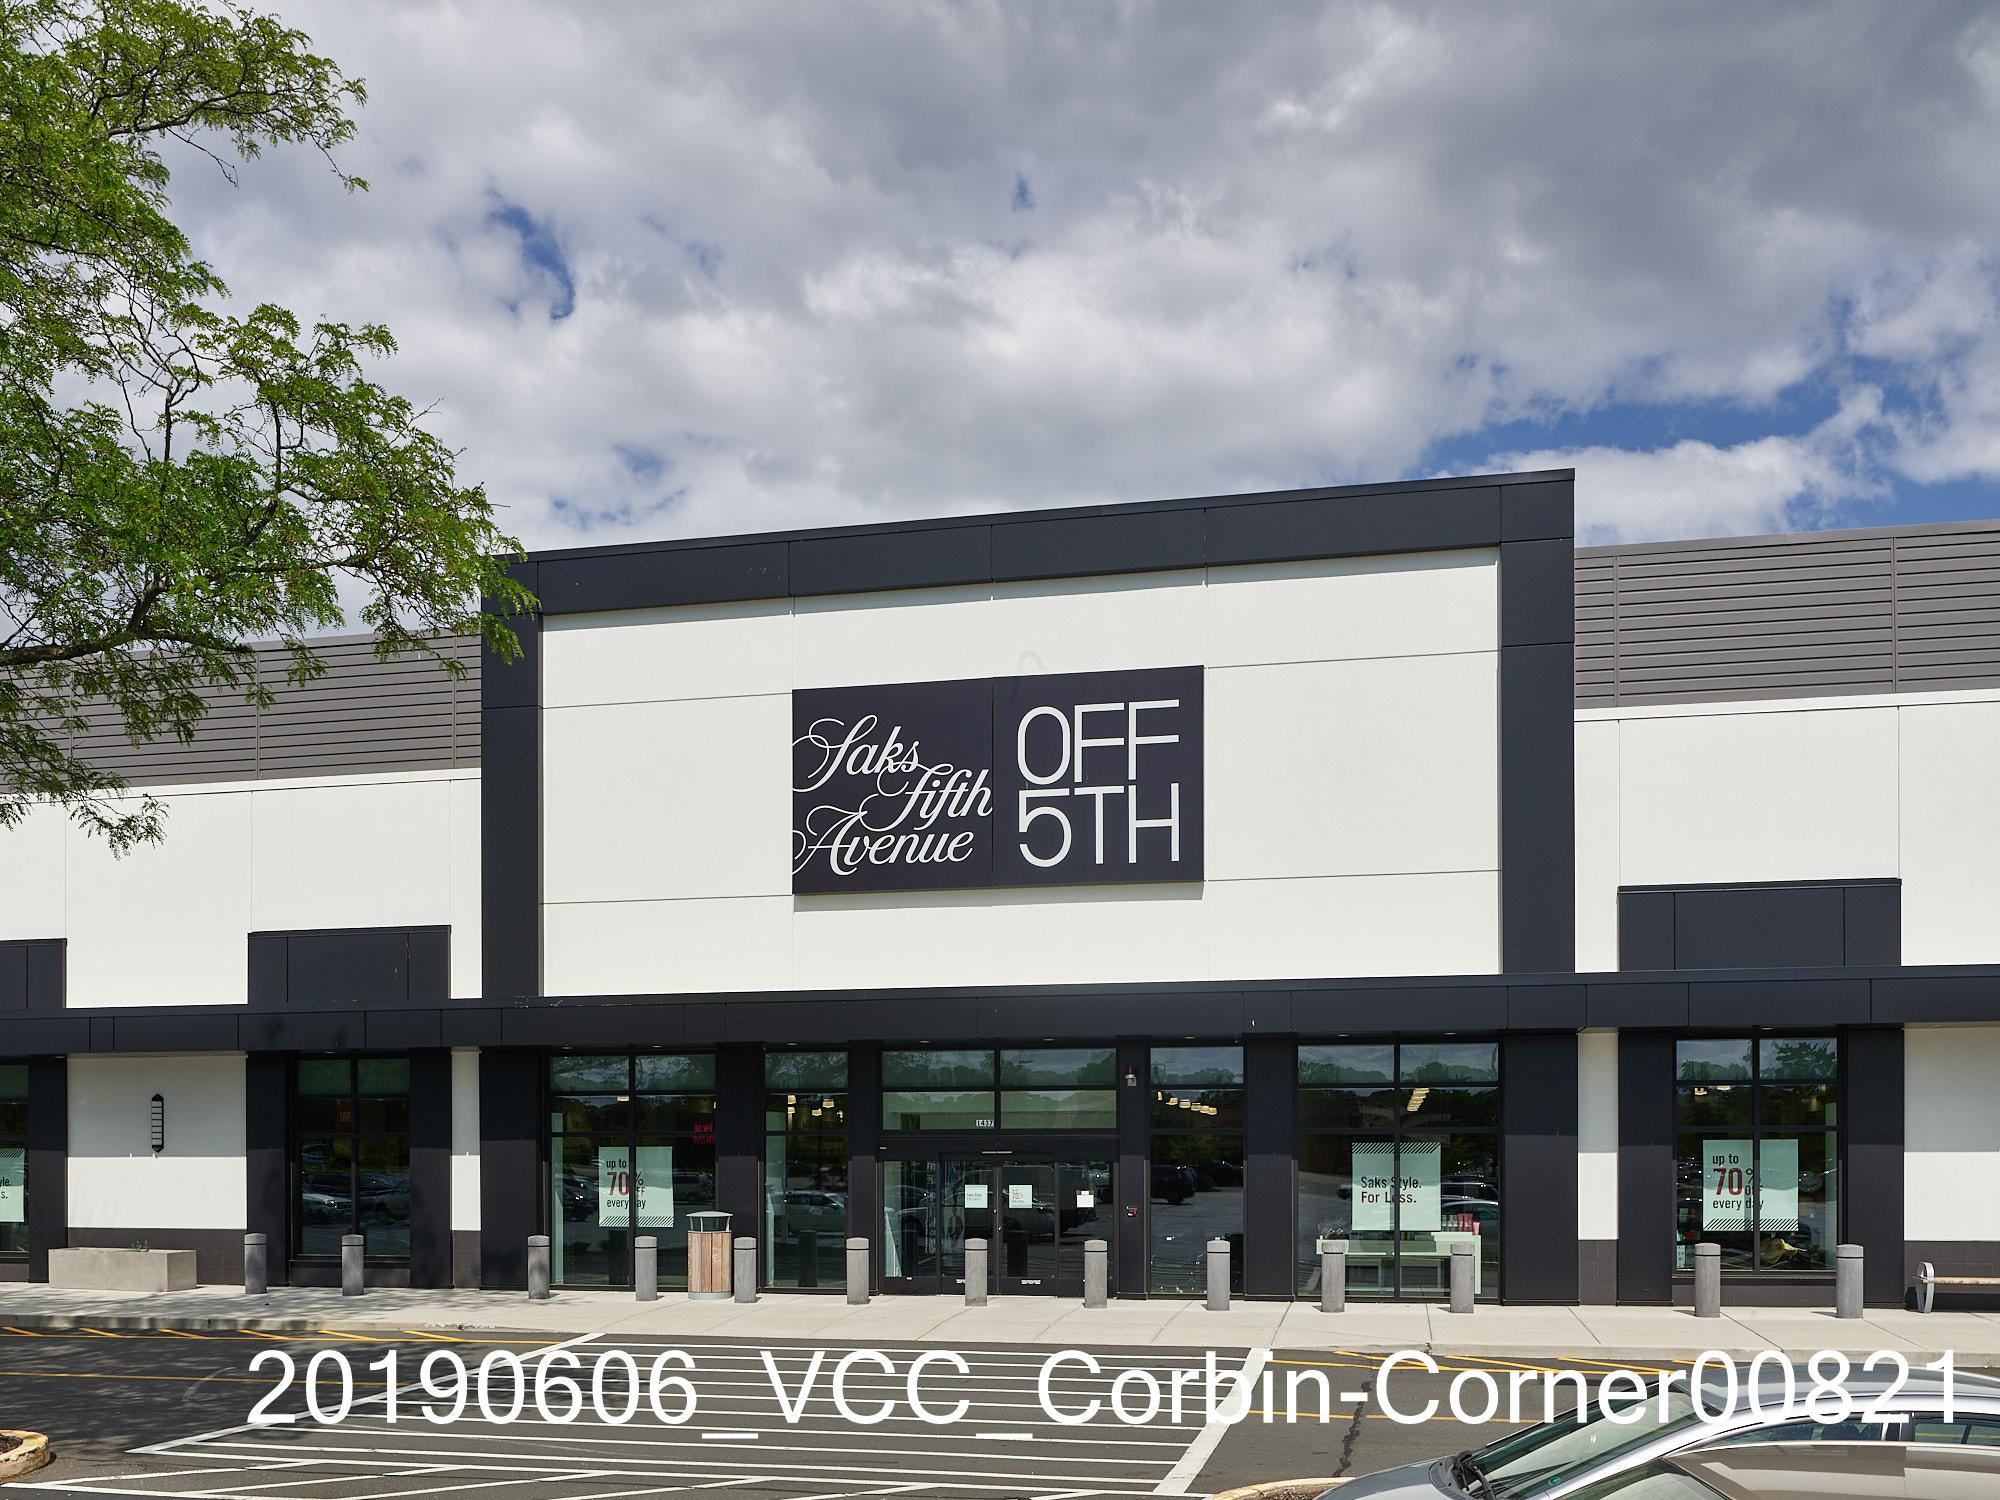 20190606_VCC_Corbin-Corner00821.jpg